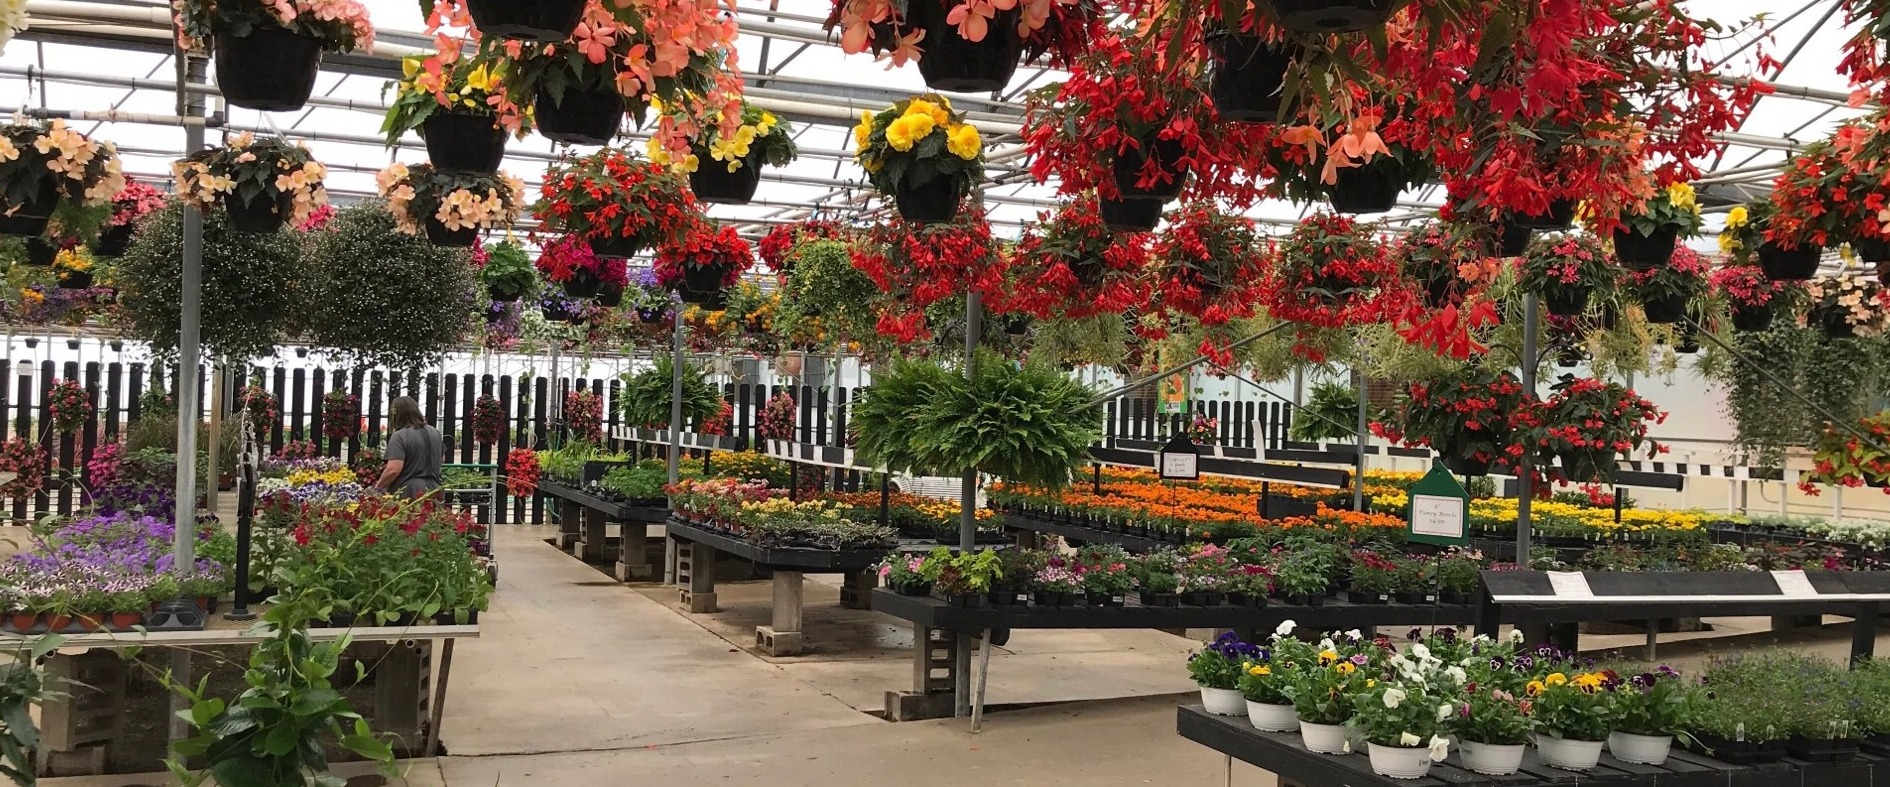 K Drive Greenhouse: East Leroy, MI: Flowers, Trees, Shrubs, Plants ...